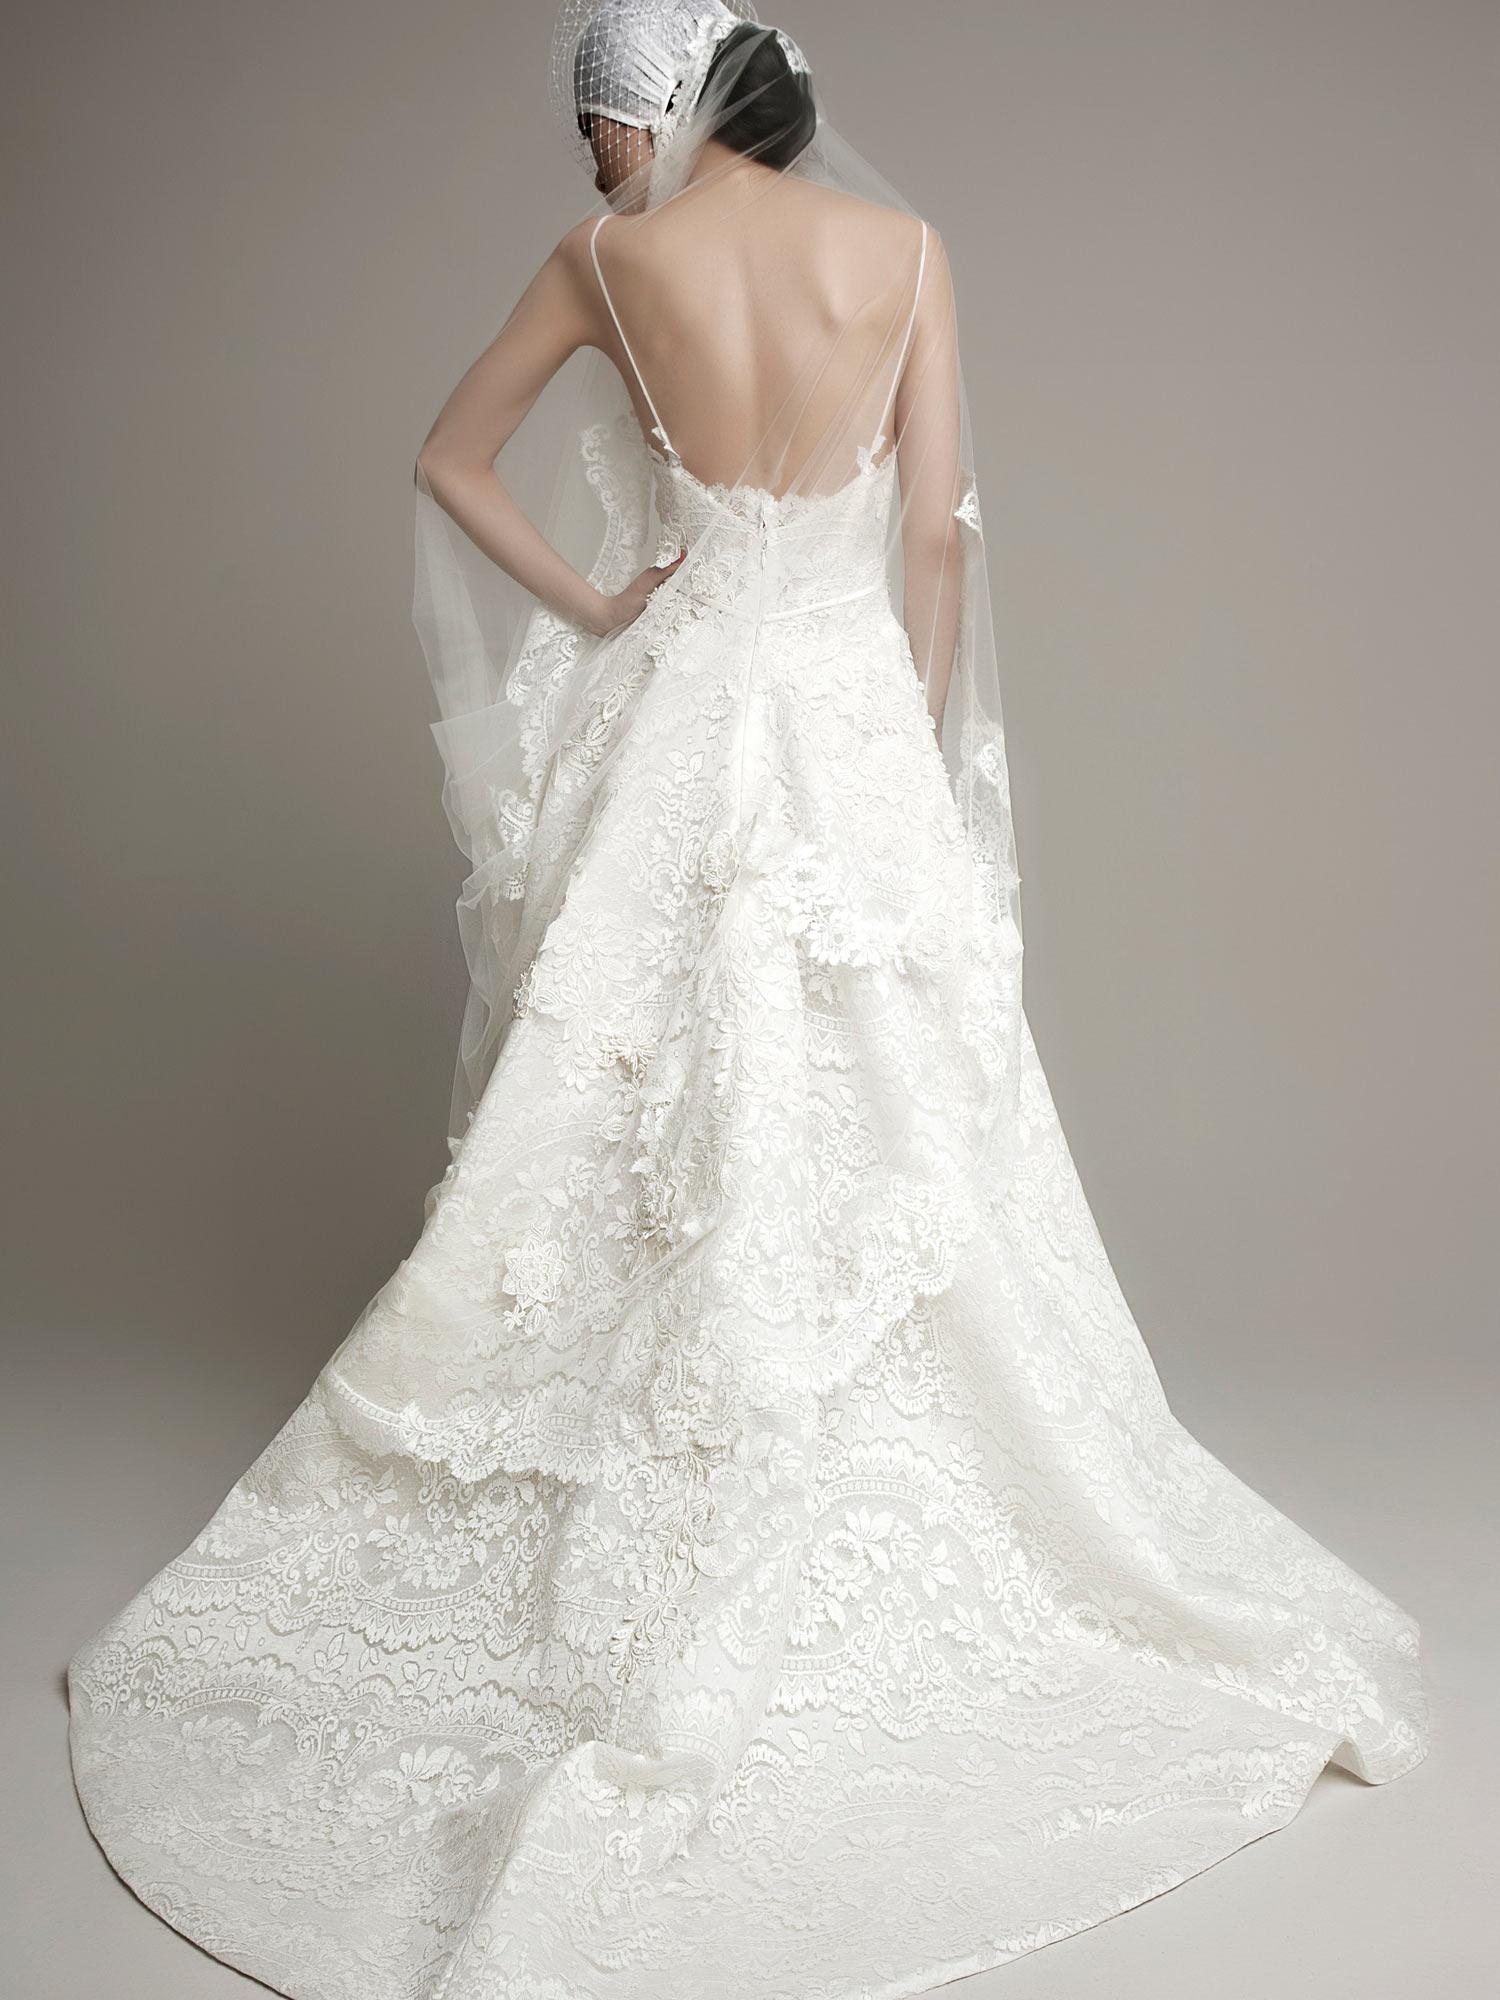 wedding-dresses-abiti_da_sposa_pizzo_moderni_abito_da_sposas_di_design_moderni abiti_da_sposa_casamento_wedding_YolanCris_Yolan_Cris_REQUENA-4.jpg